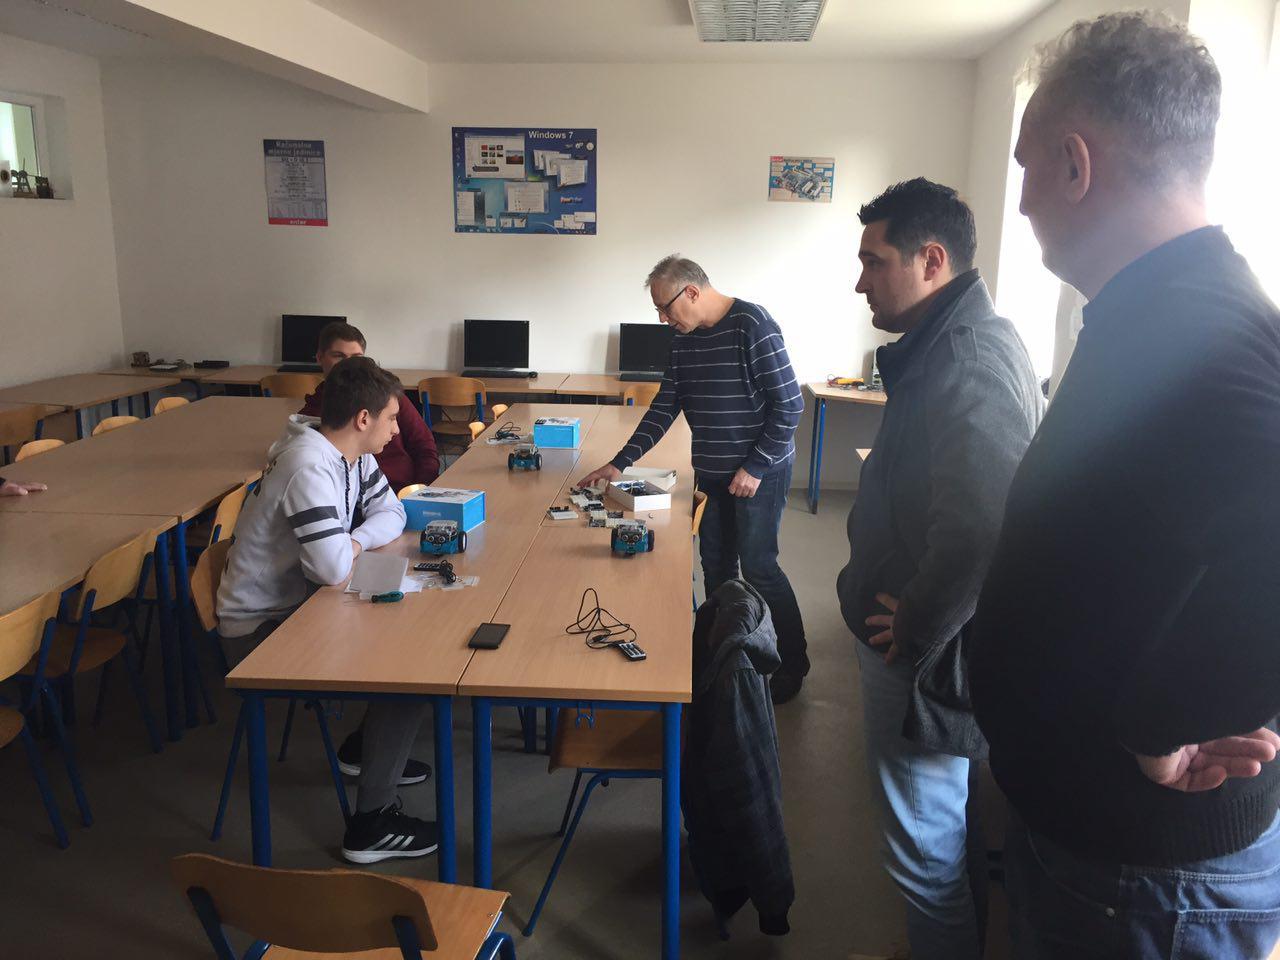 photo_2016-12-10_11-39-08_radionica_robotika_croatian_makers_srednja_ivan_seljanec_inovatorsko_drustvo_marcel_kiepach